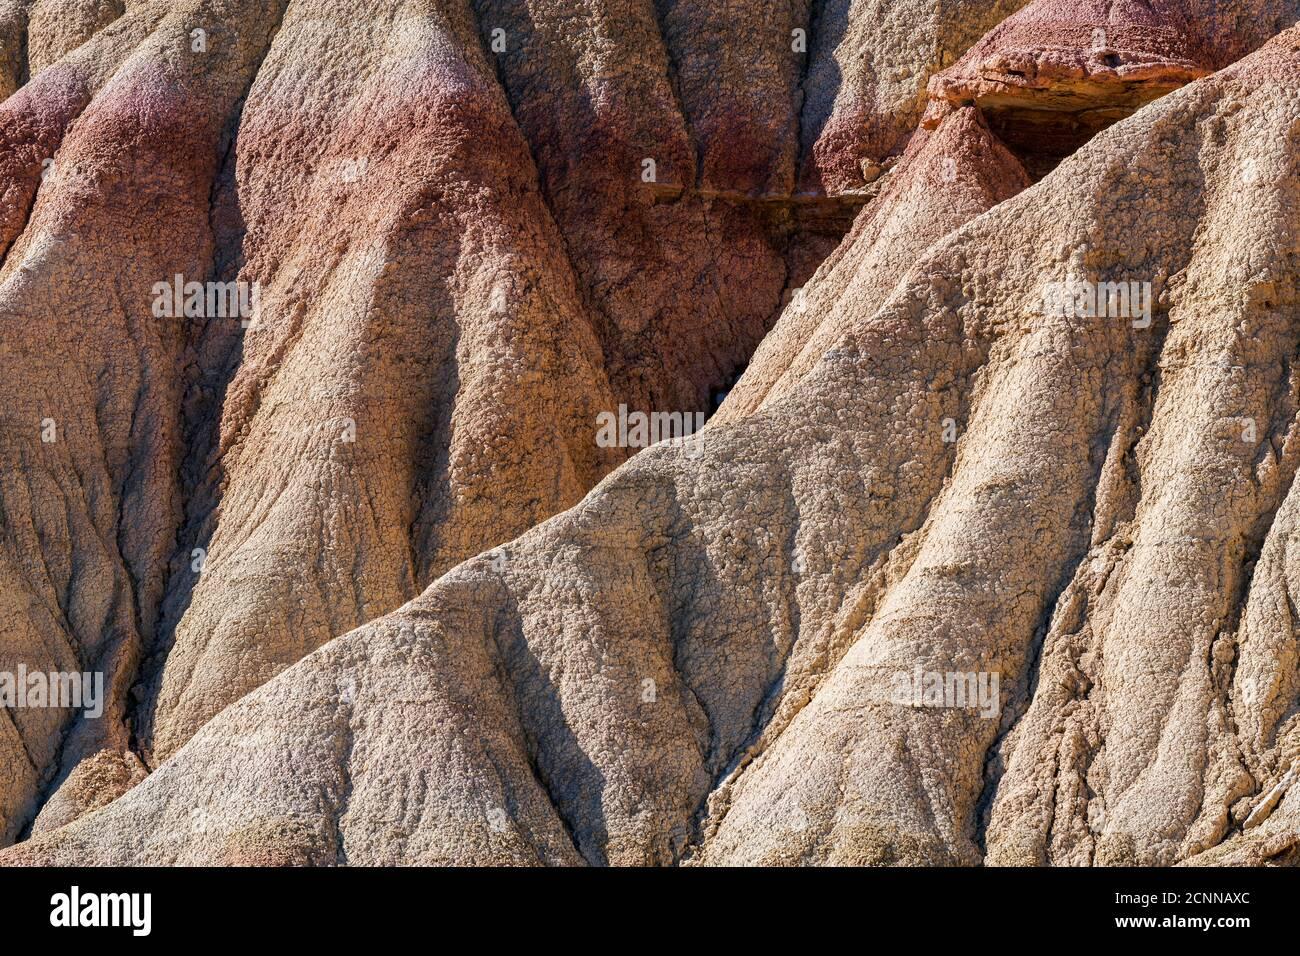 Rock formations, Bardenas Reales badlands, Navarre, Spain Stock Photo